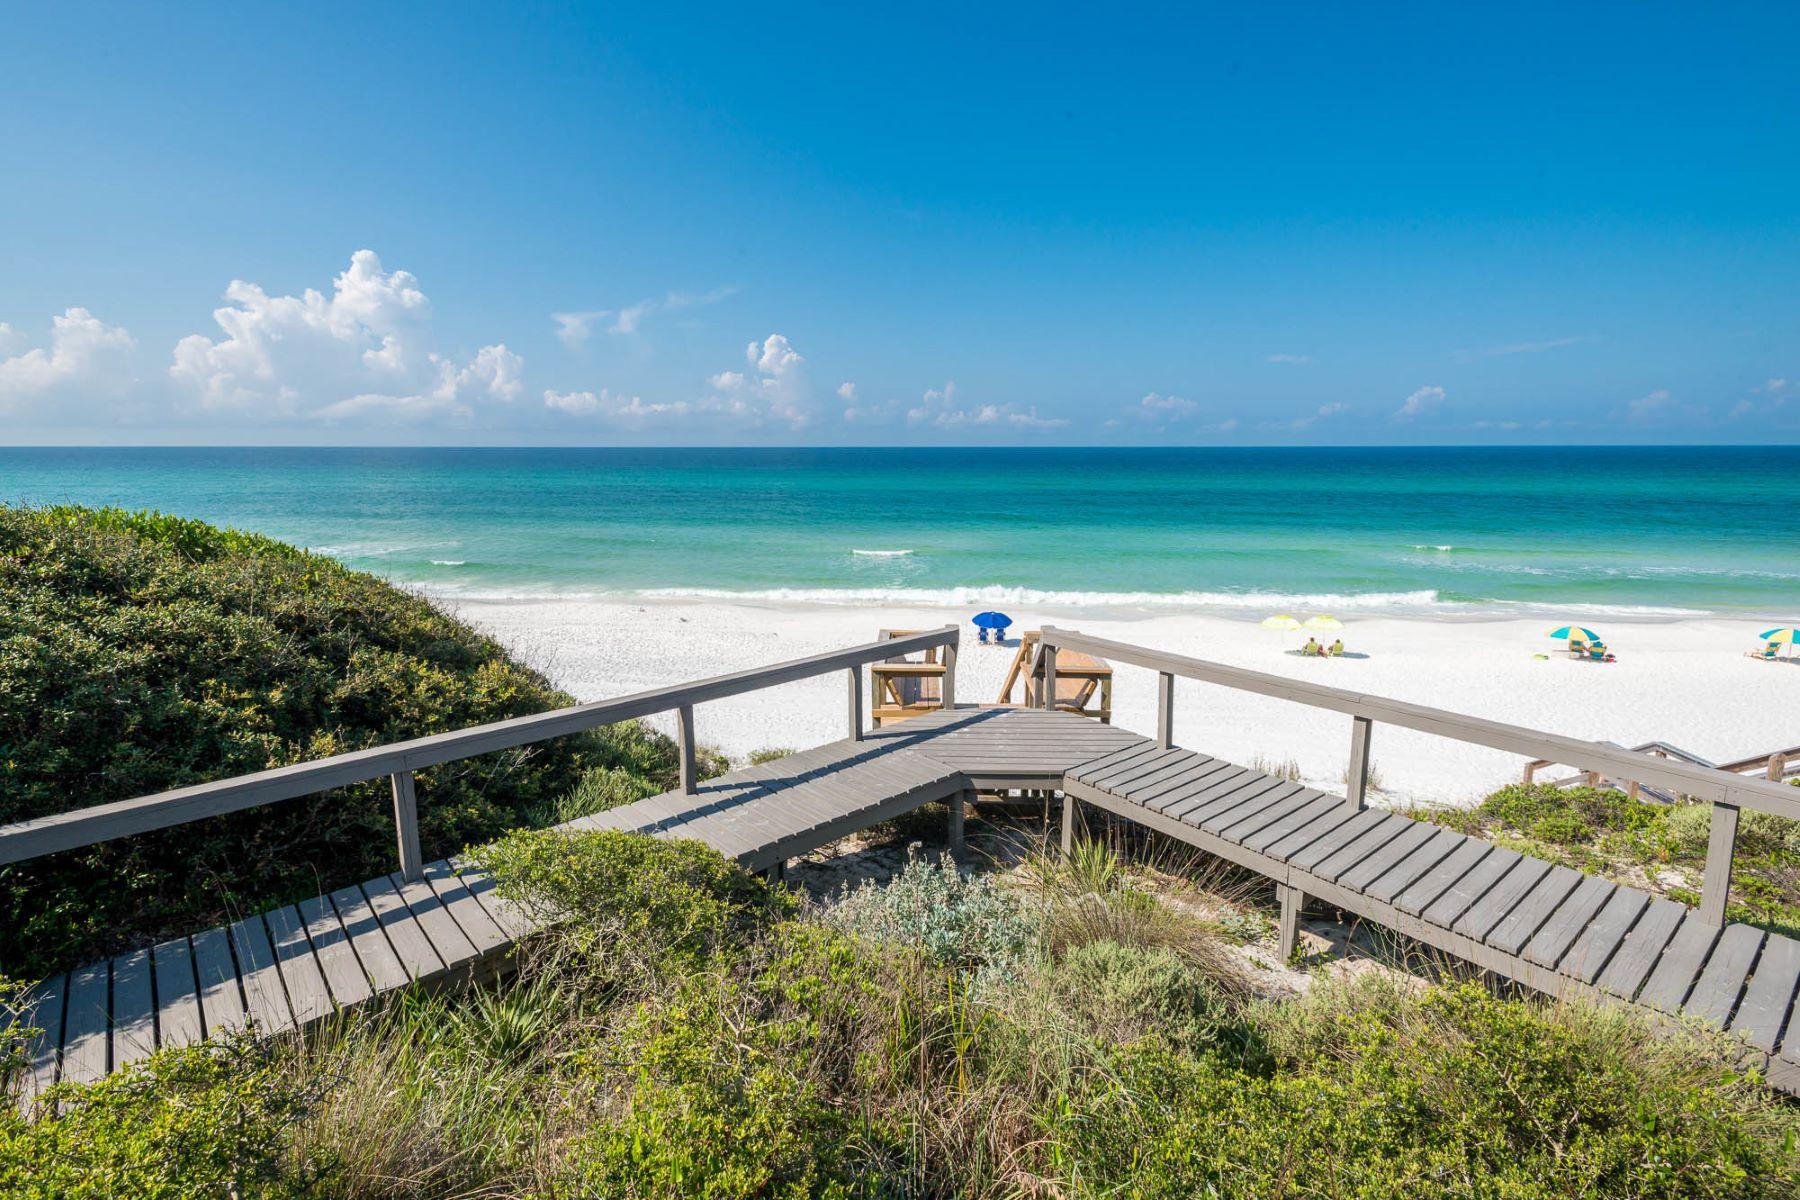 Single Family Homes für Verkauf beim Private Gulf-front Oasis Boasting 90 Feet of Beachfront 8016 East County Highway 30A, Seacrest, Florida 32461 Vereinigte Staaten